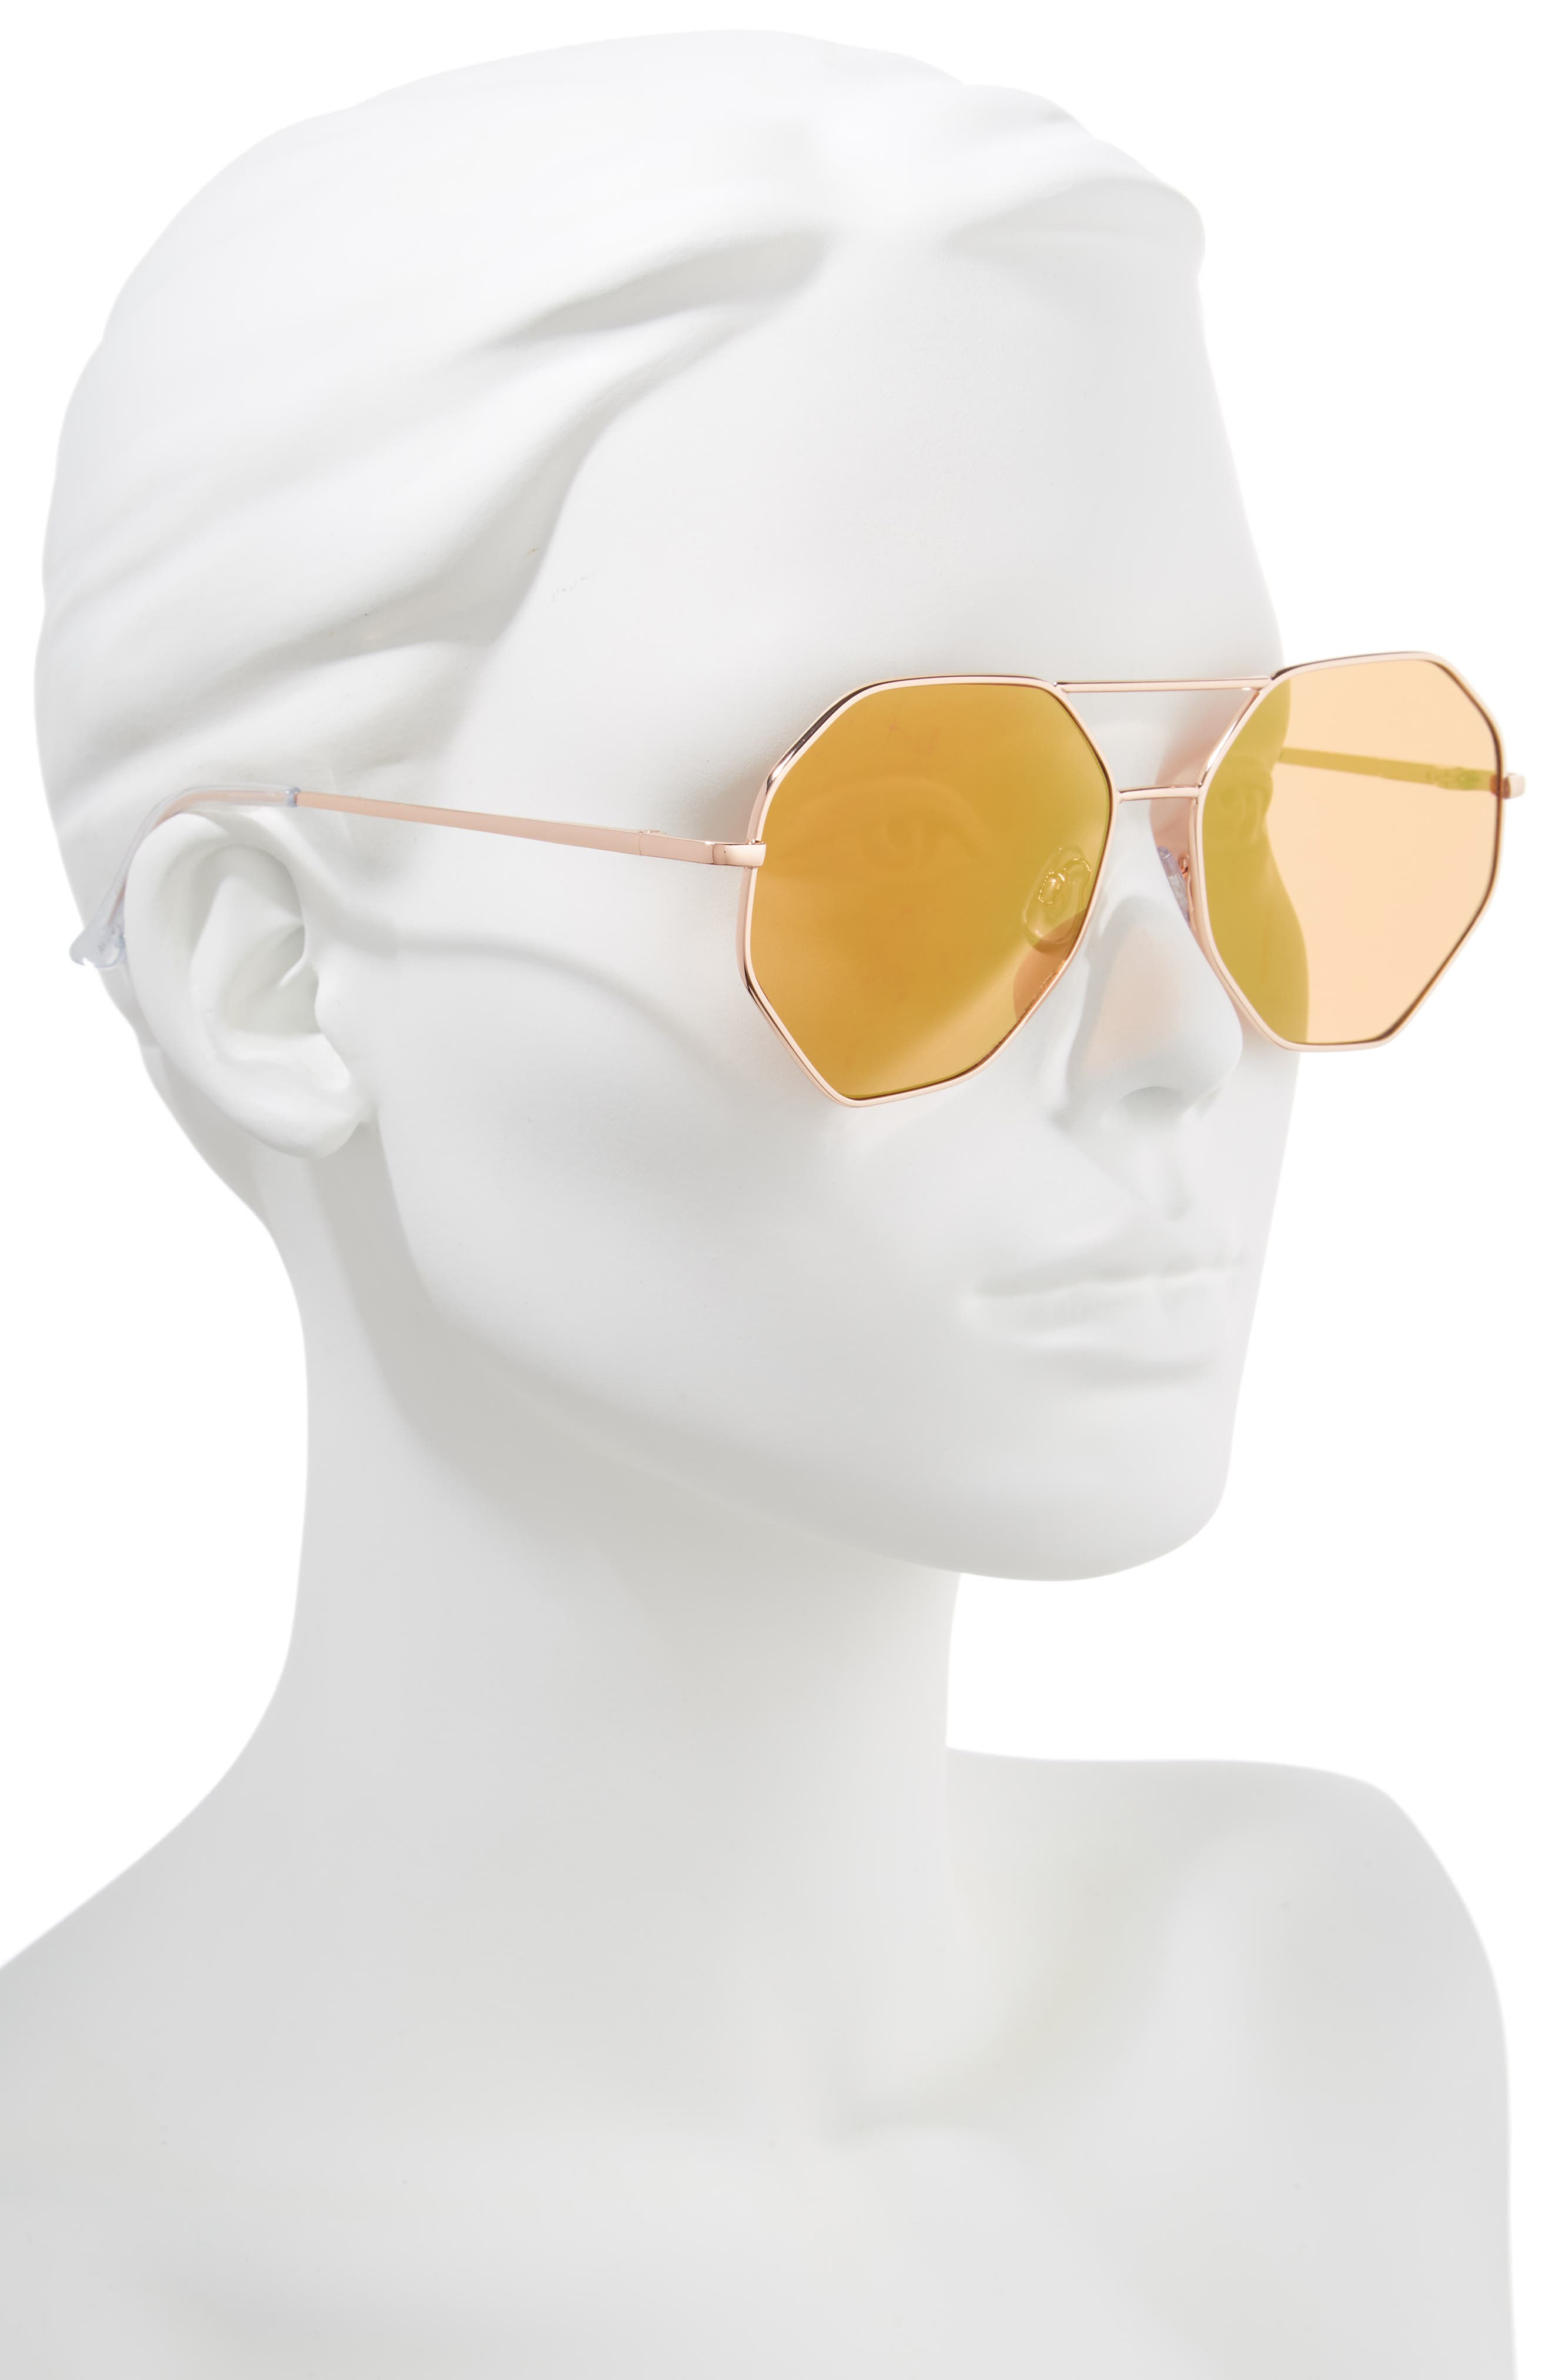 Hexcon Aviator Sunglasses,                             Alternate thumbnail 2, color,                             710